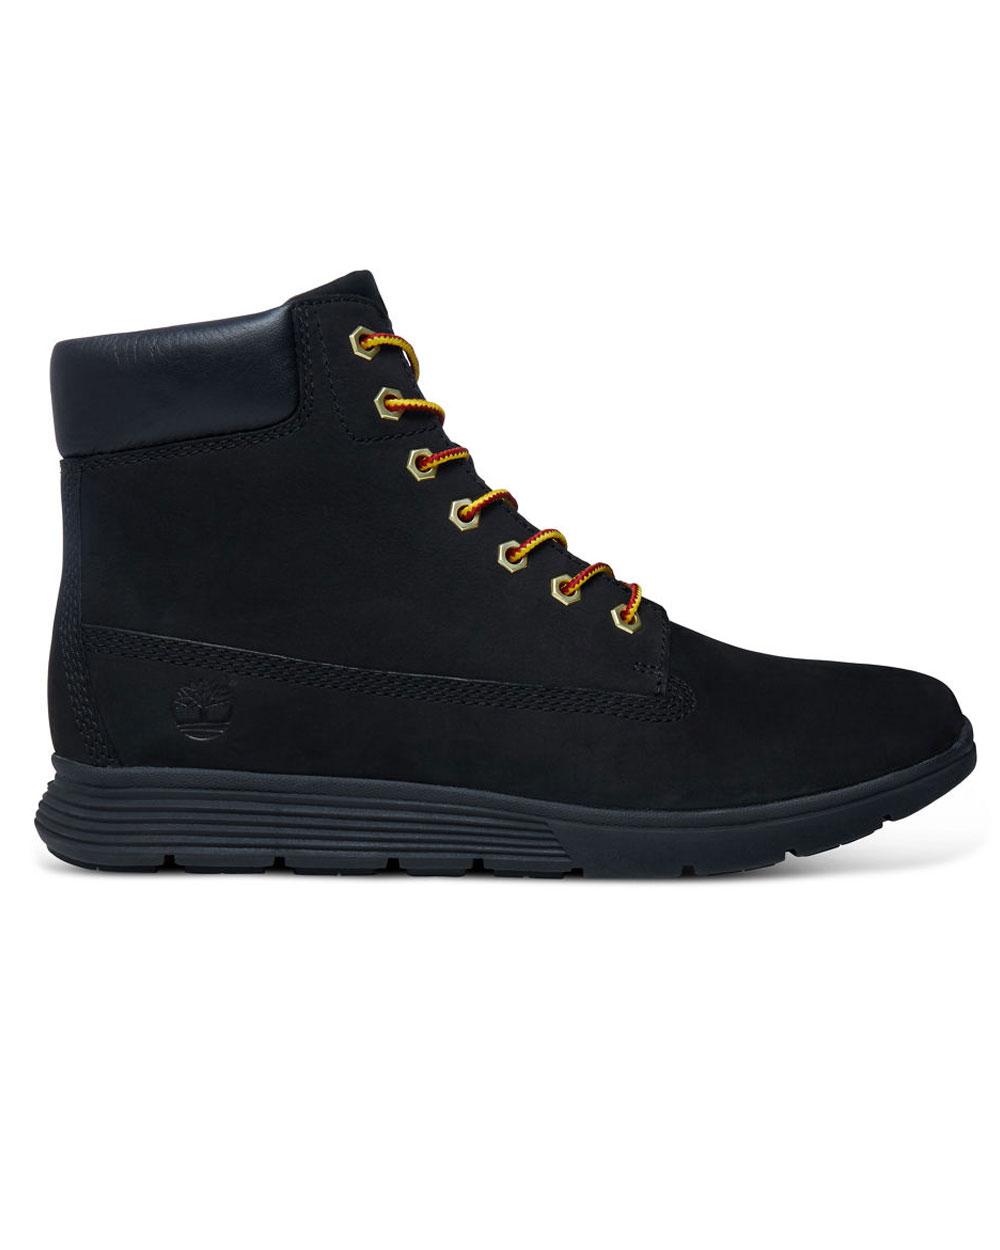 13803edb3eb Timberland Killington 6 Inch Size 13/14/15 Boot (black)